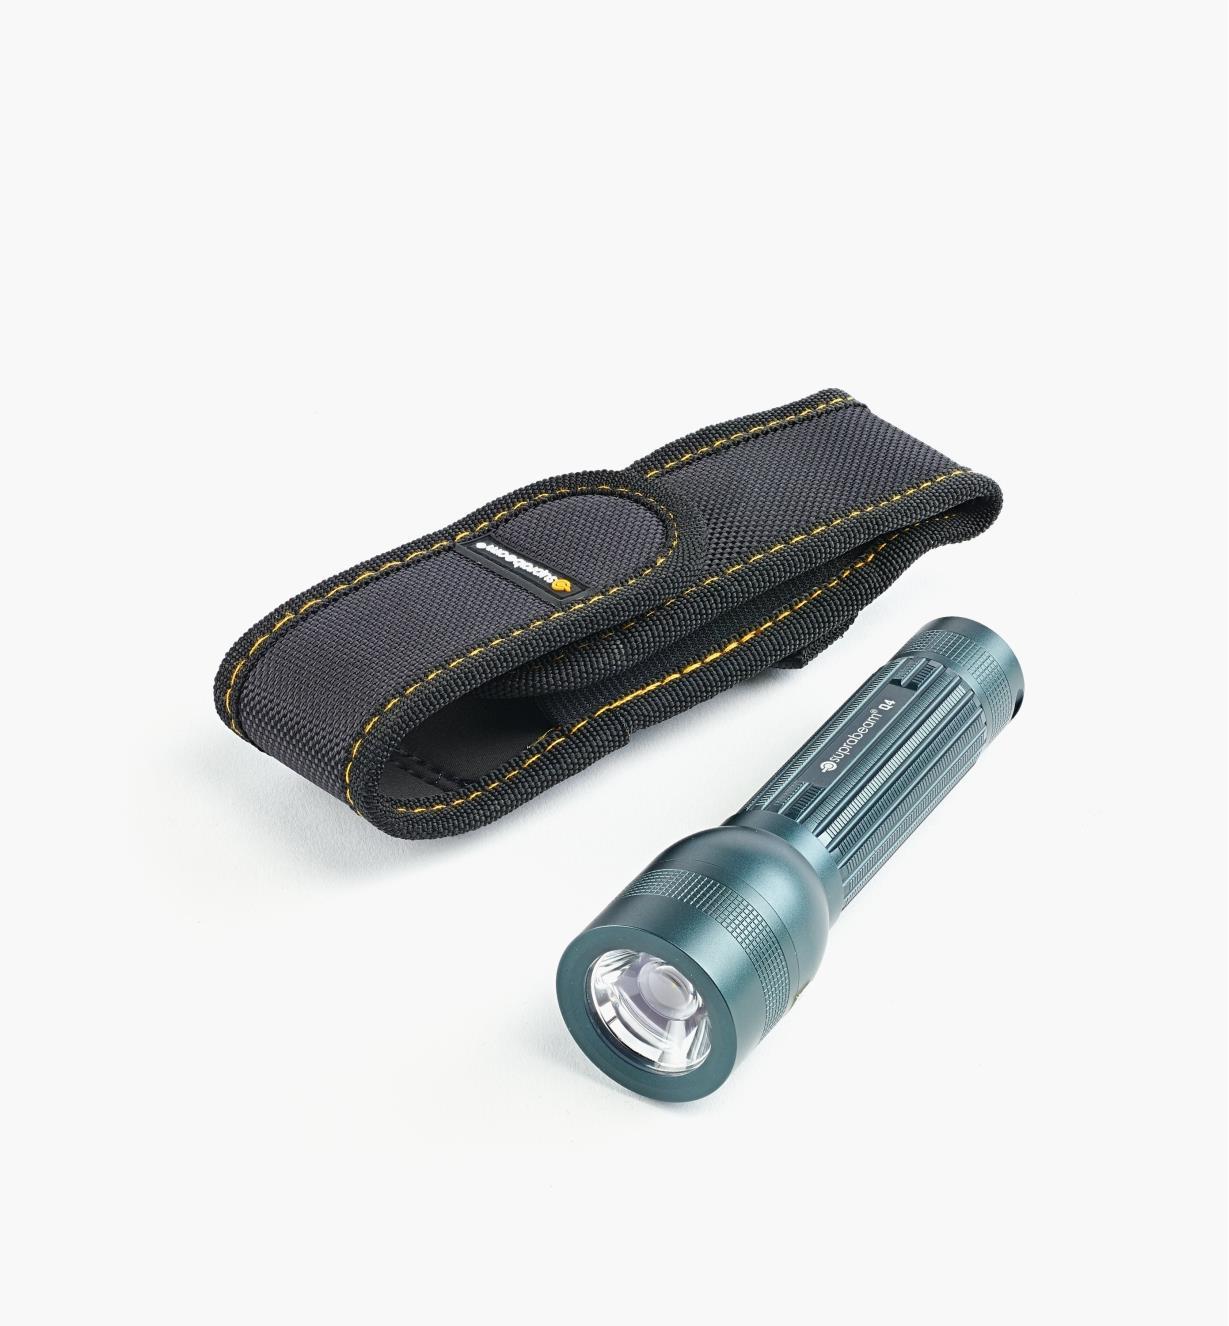 45K1983 - Lampe de pocheQ4, 400lumens